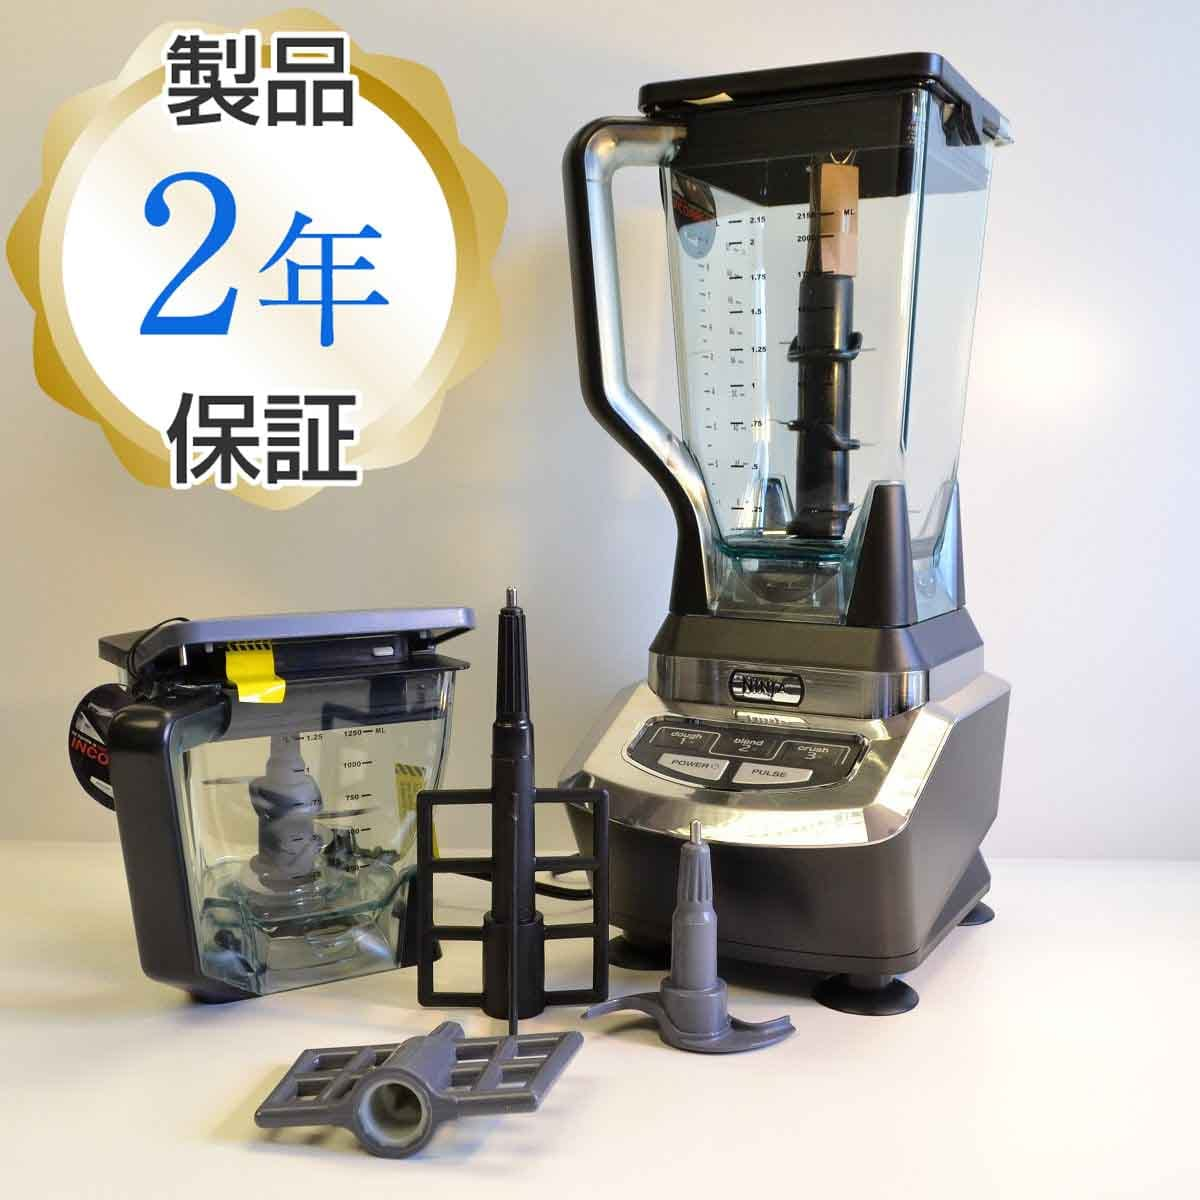 Ninja Bl700 Kitchen System: Alphaespace: Ninja Kitchen System Blender & Food Processor